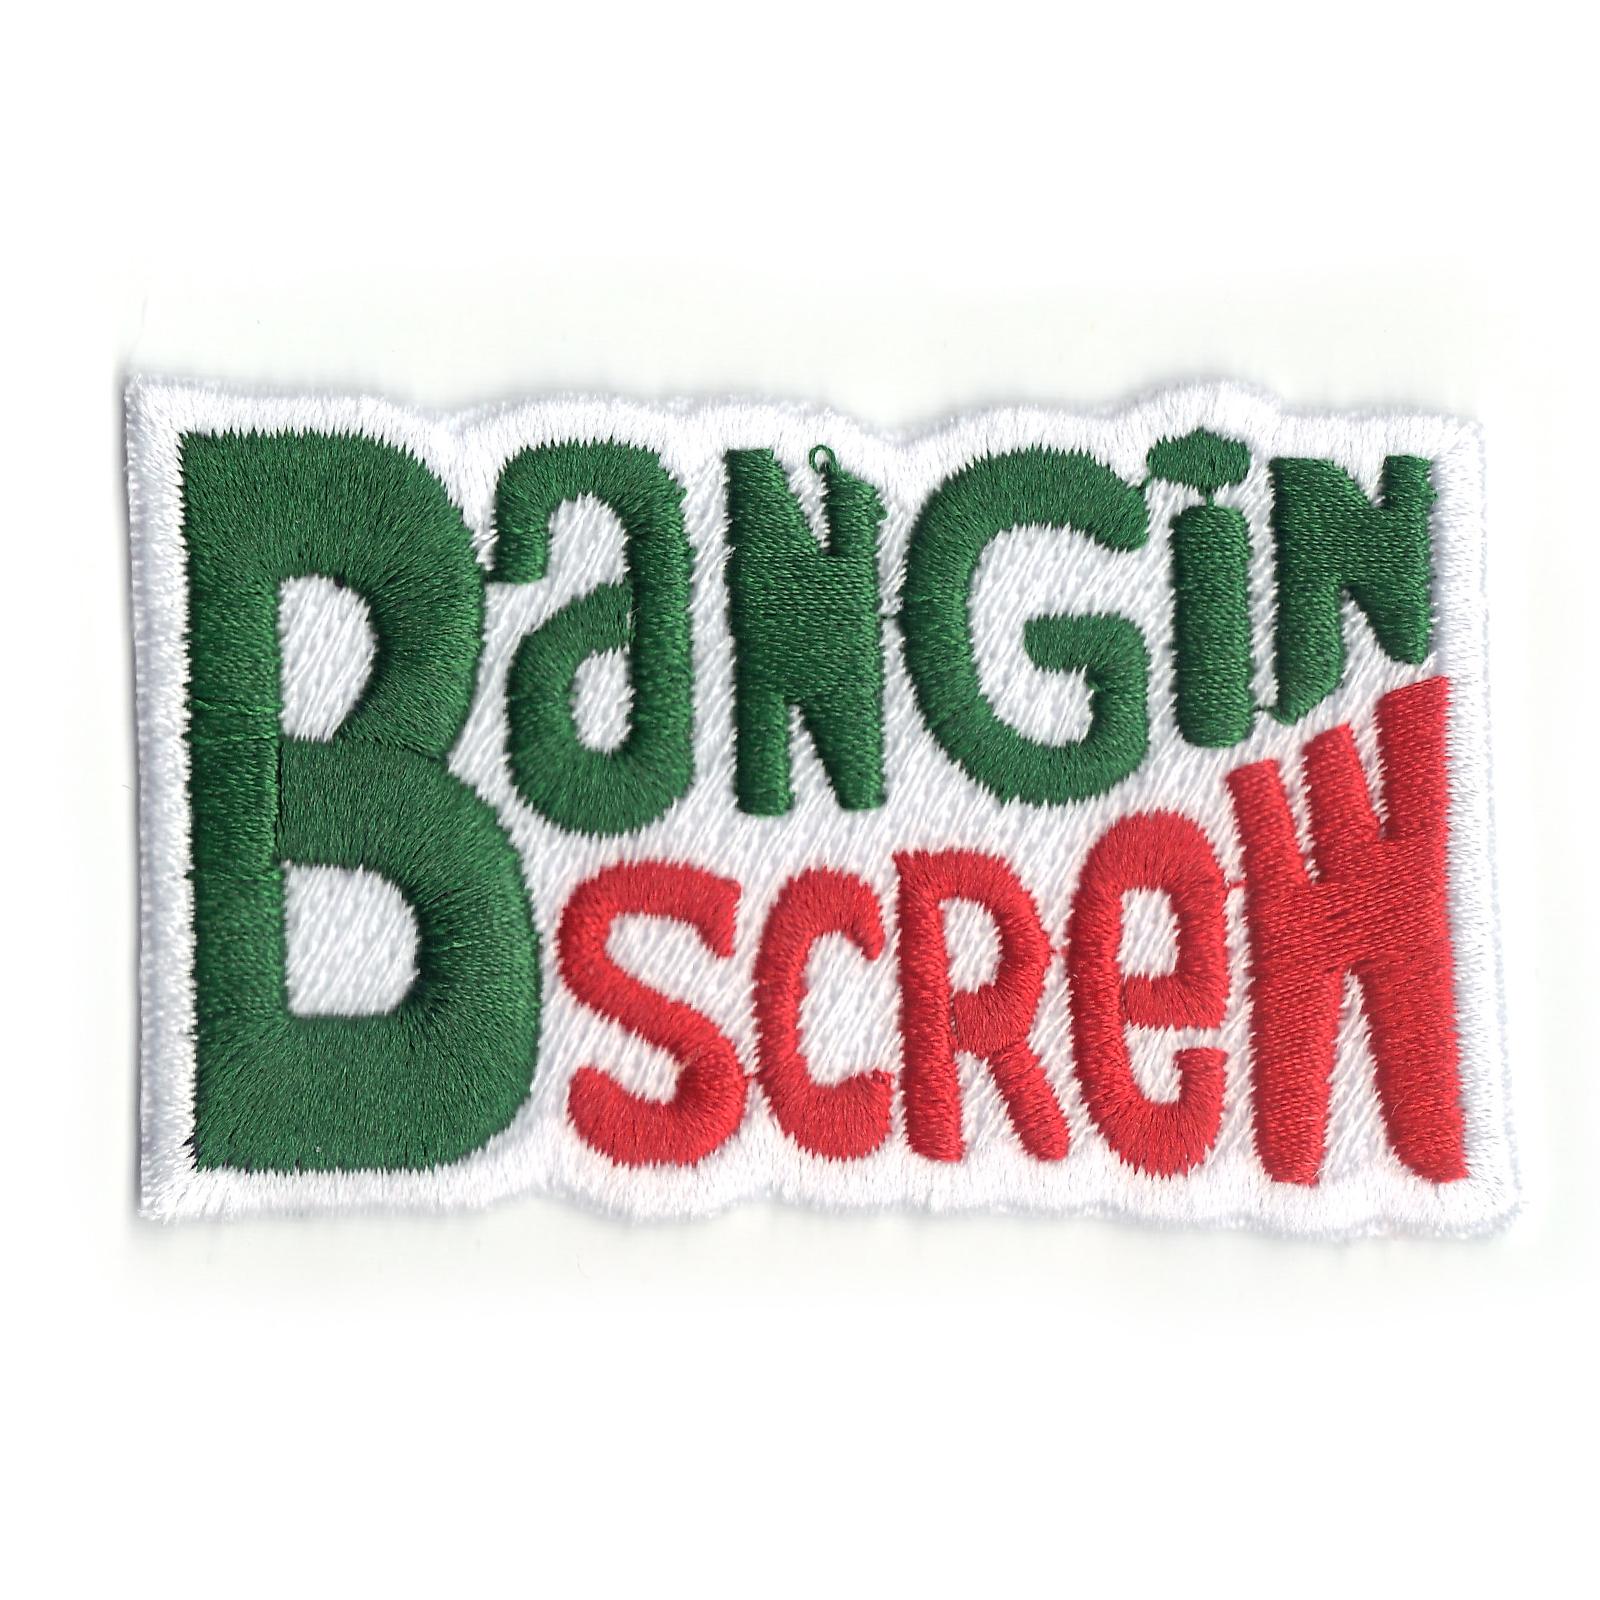 Houston Bangin Screw Soda Logo Iron On Patch